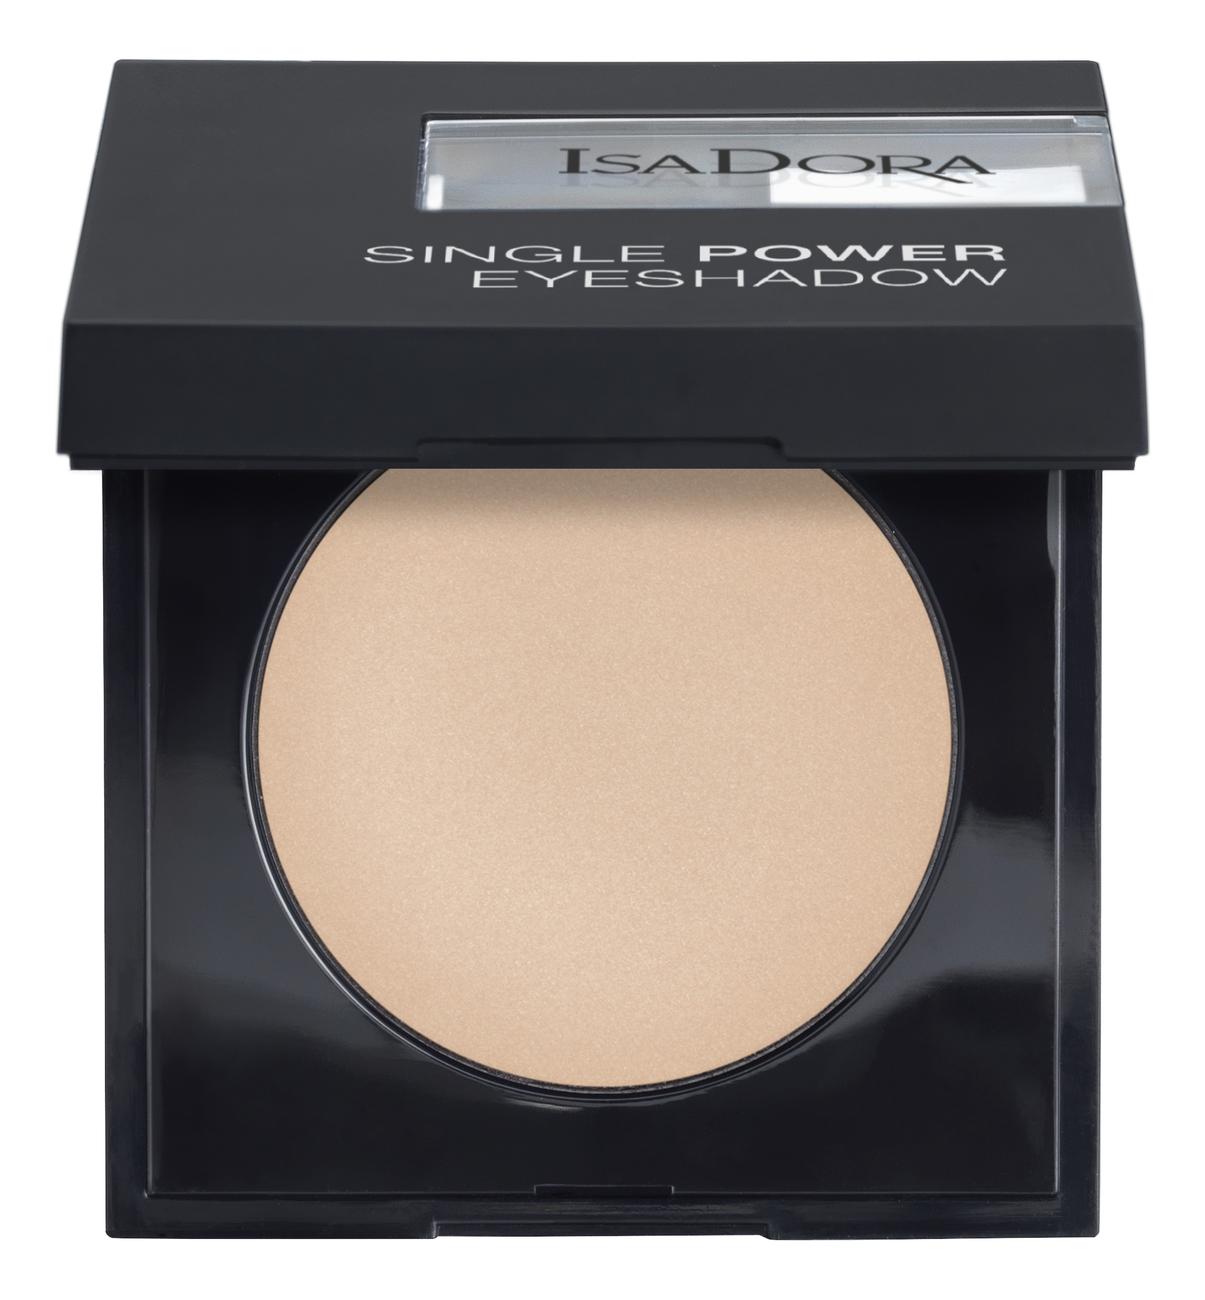 Фото - Тени для век Single Power Eyeshadow 2,2г: 01 Bare Beige тени для век single power eyeshadow 2 2г 05 pink sand